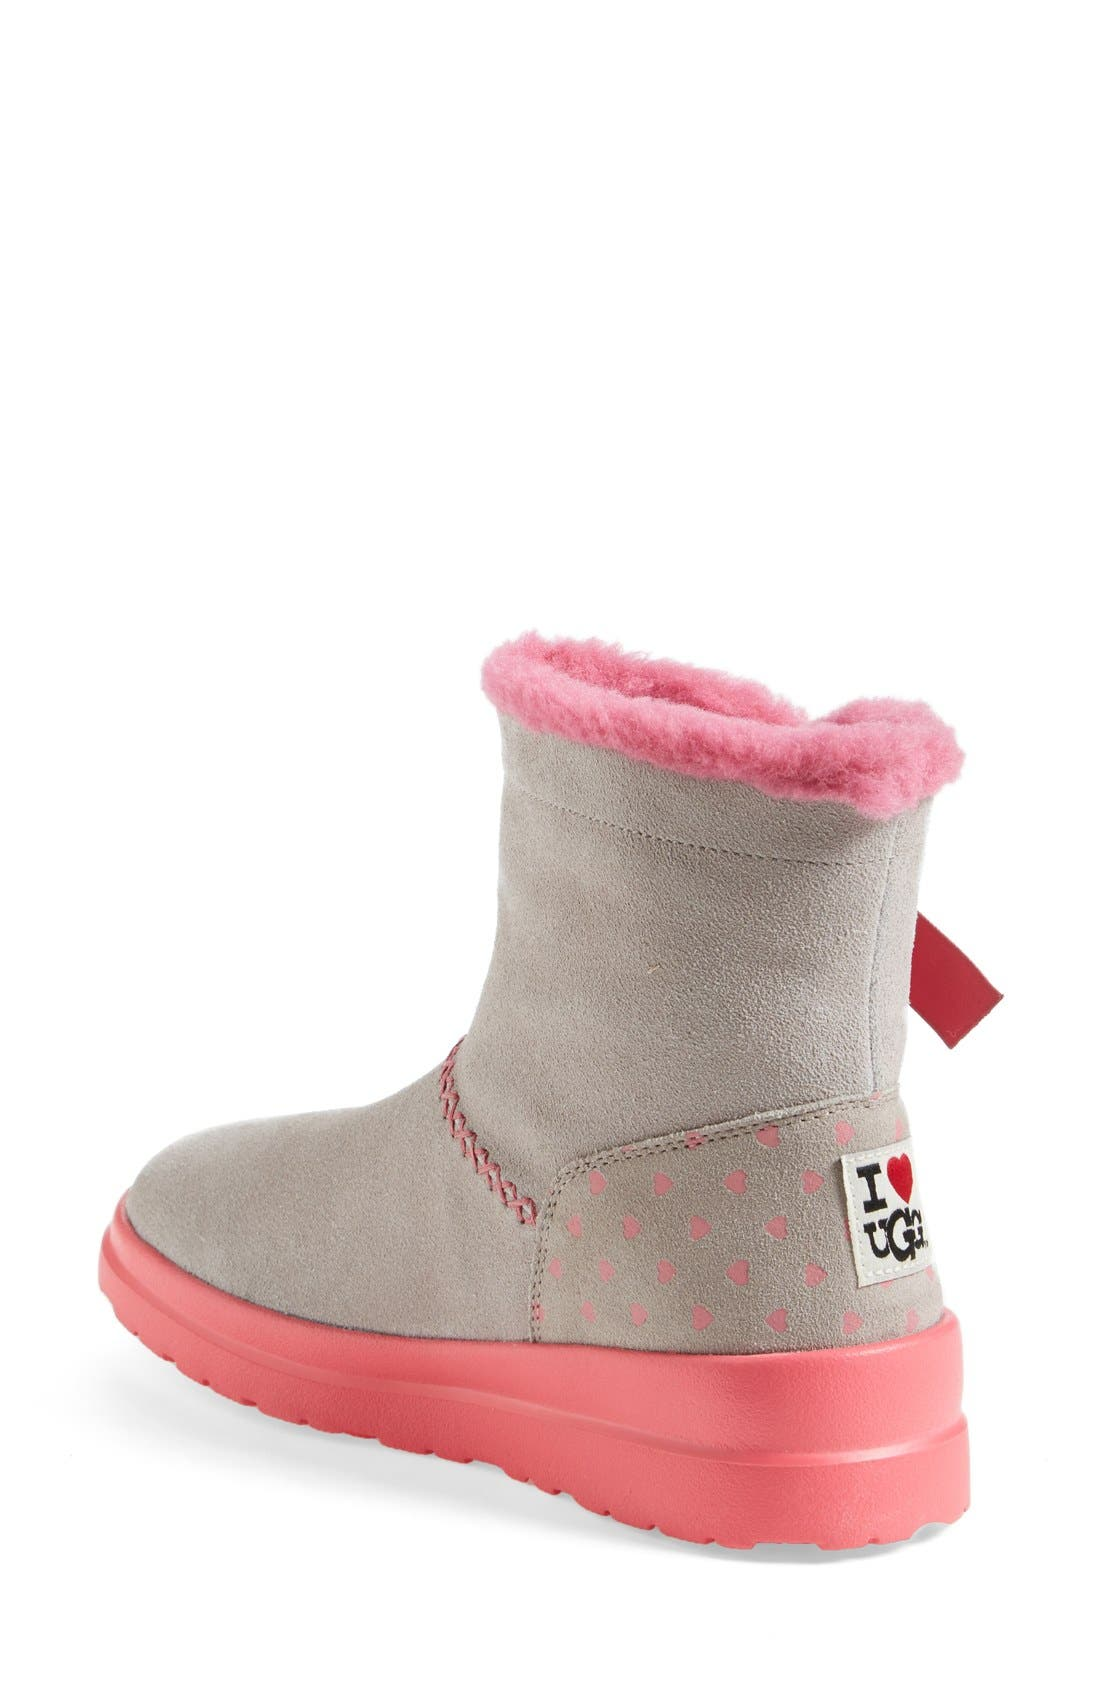 Alternate Image 2  - I Heart UGG™ by UGG® Australia 'I Heart Knotty' Boot